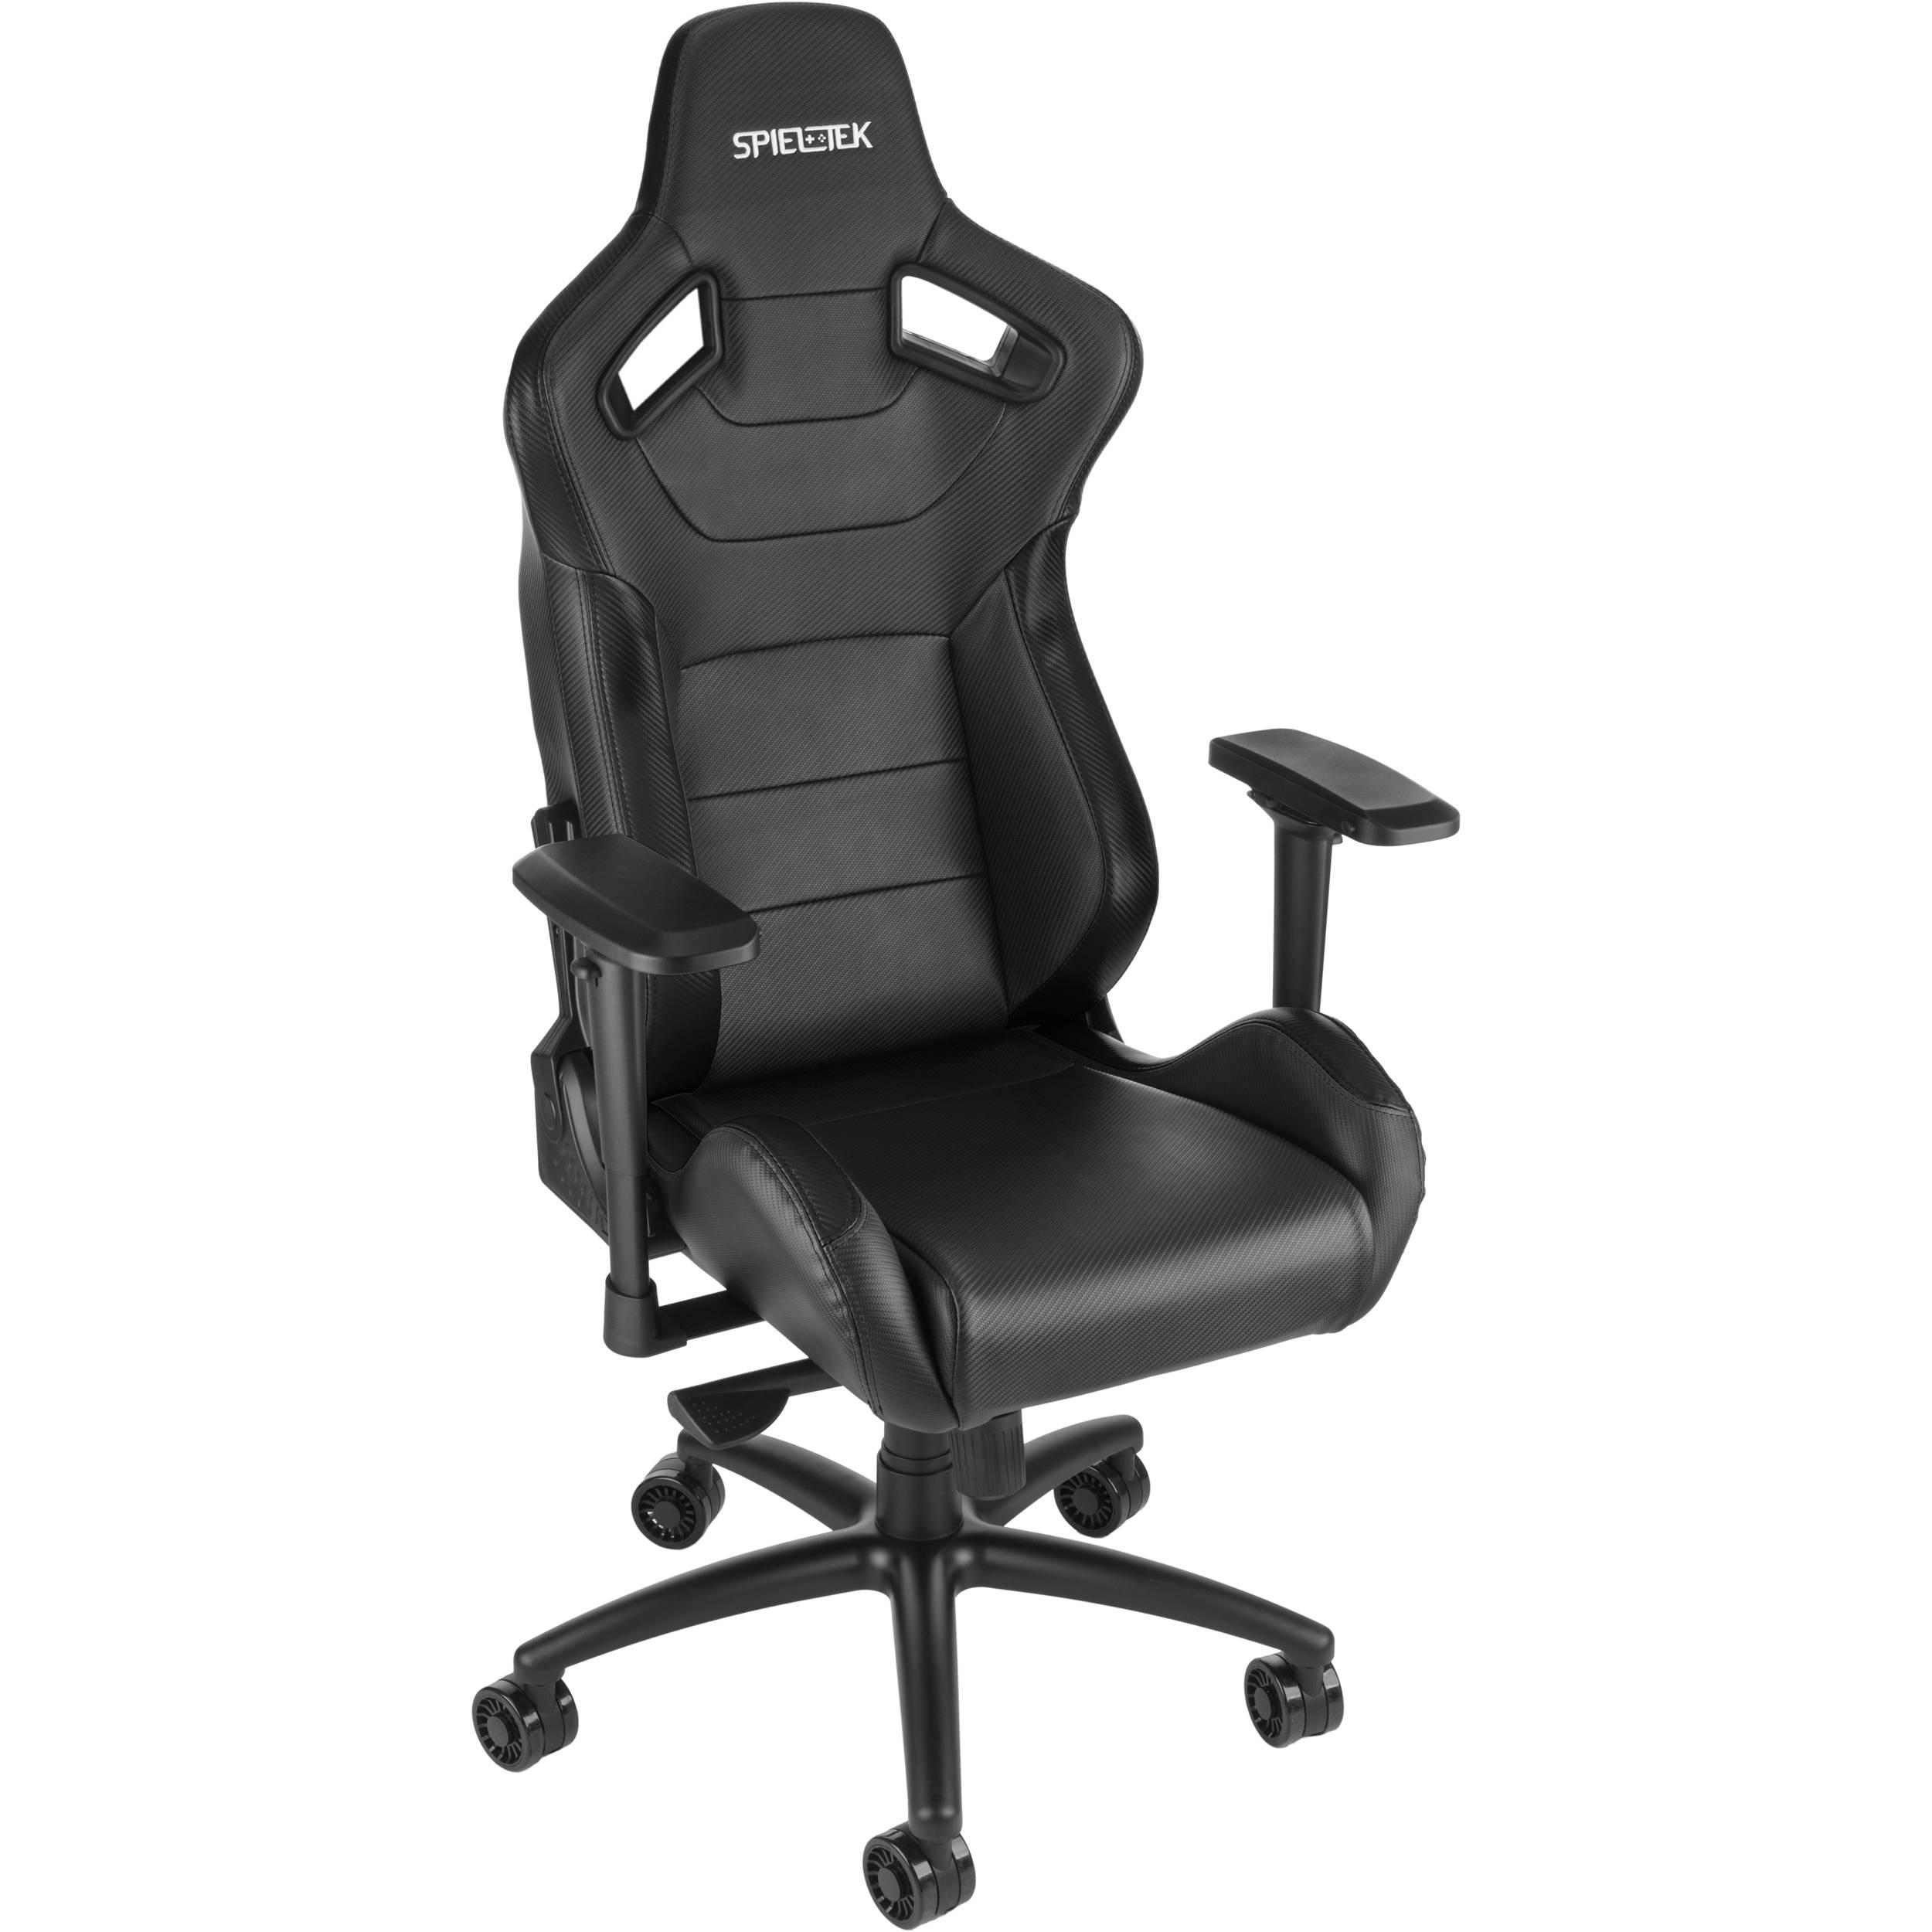 Prime Spieltek Admiral Gaming Chair V2 Black Inzonedesignstudio Interior Chair Design Inzonedesignstudiocom